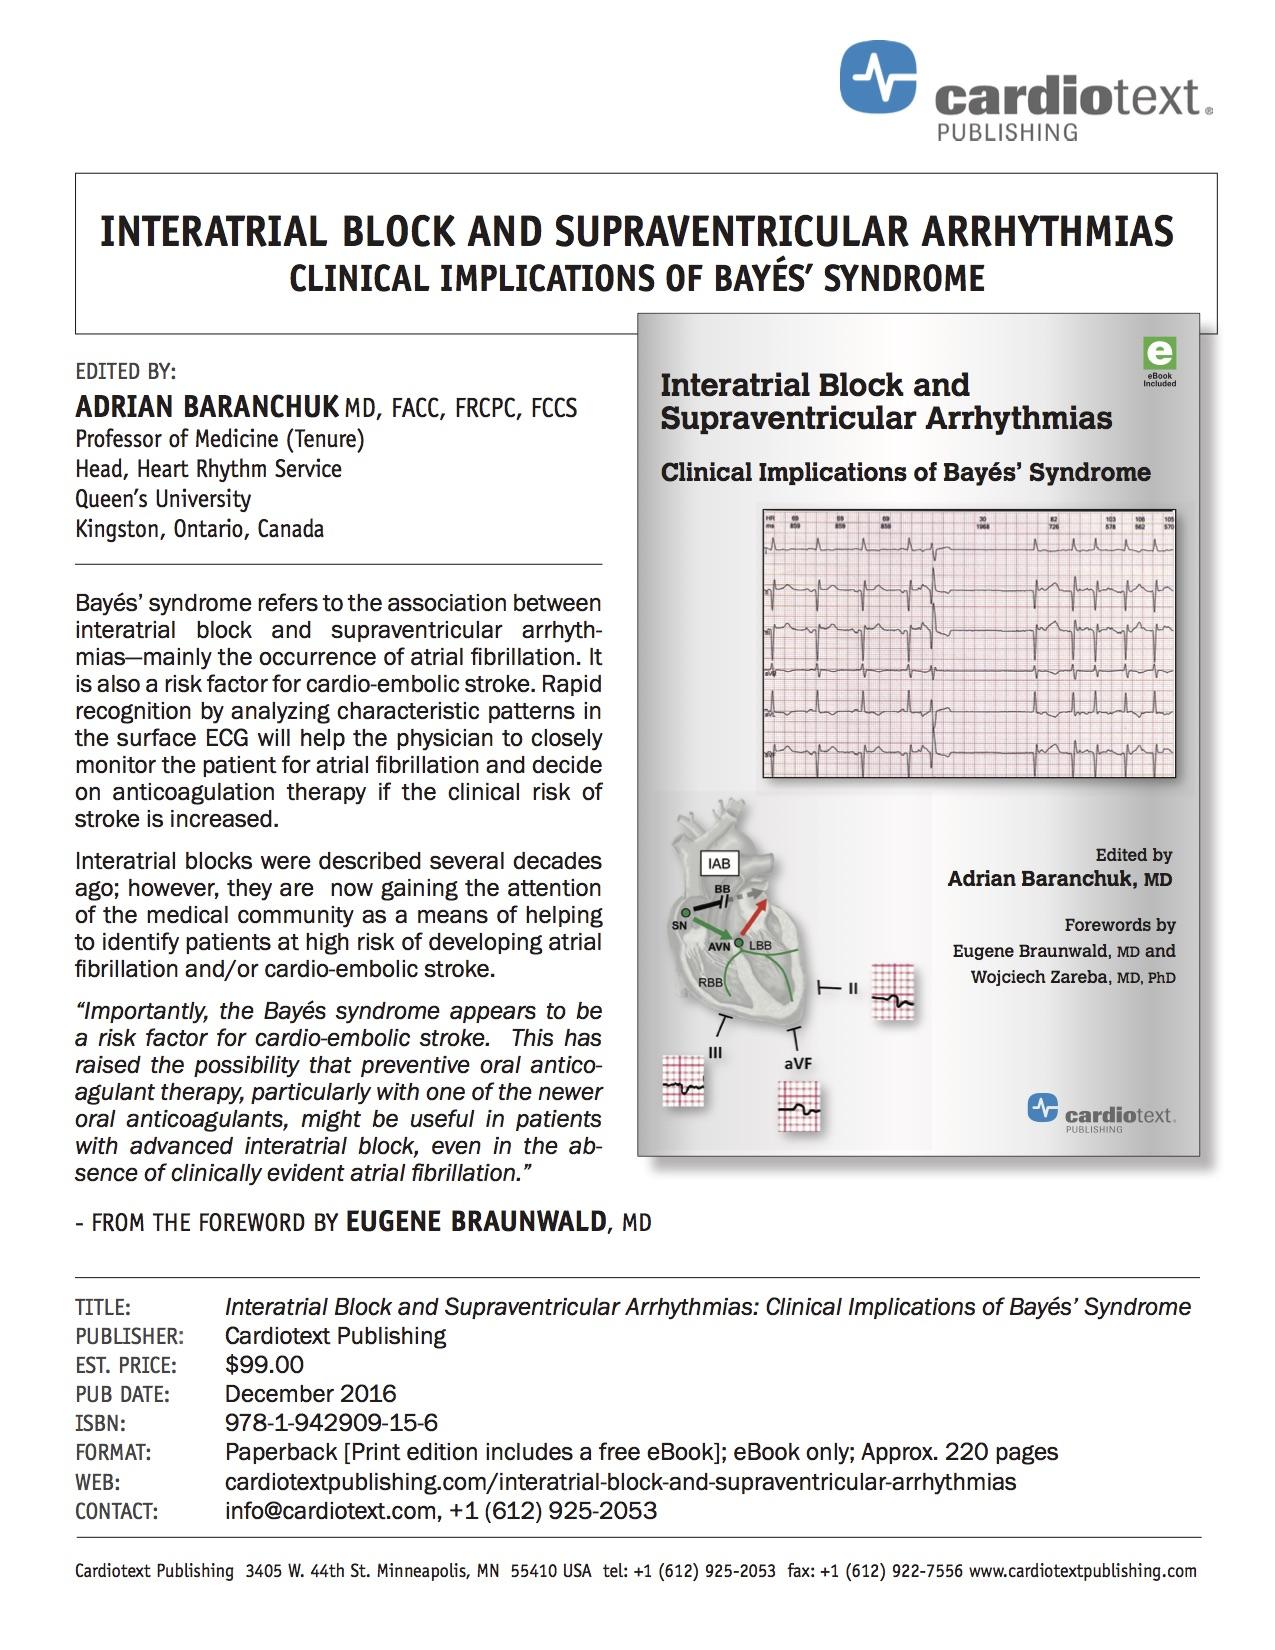 INTERATRIAL BLOCK AND SUPRAVENTRICULAR ARRHYTHMIAS CLINICAL IMPLICATIONS OF BAYÉS' SYNDROME